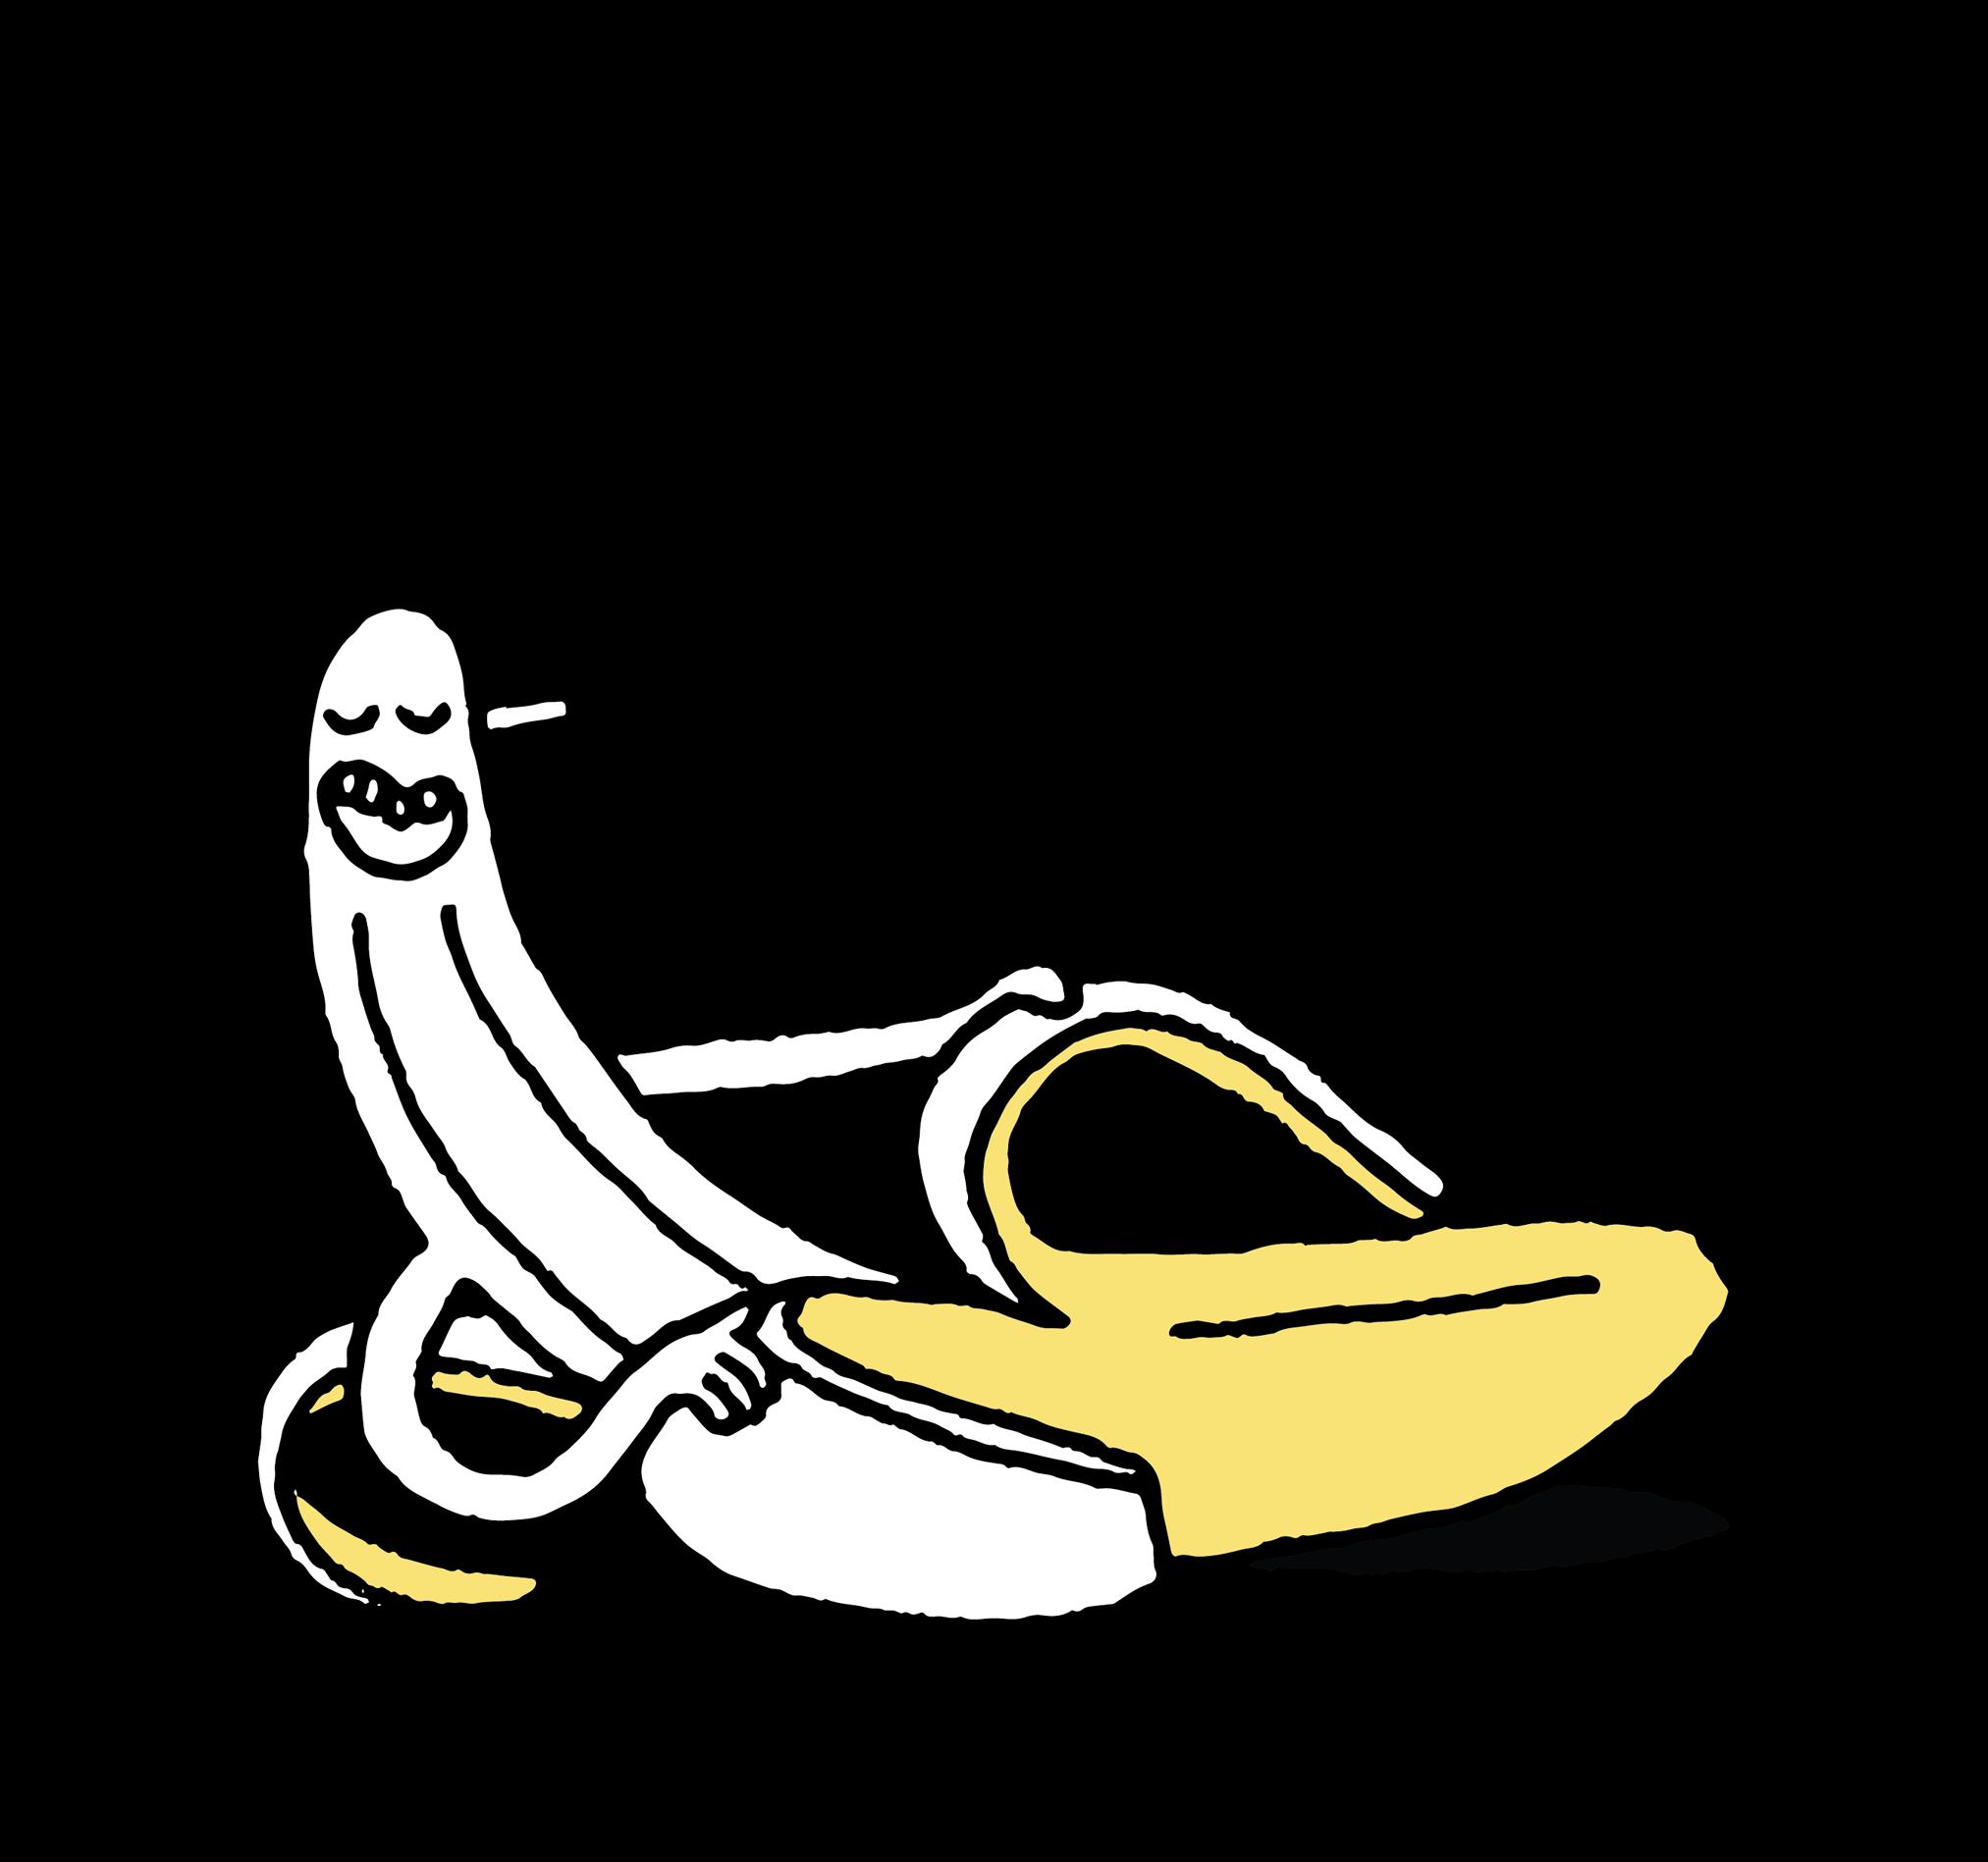 breakfastclub-trendsontrends-banana-amit-greenberg.png